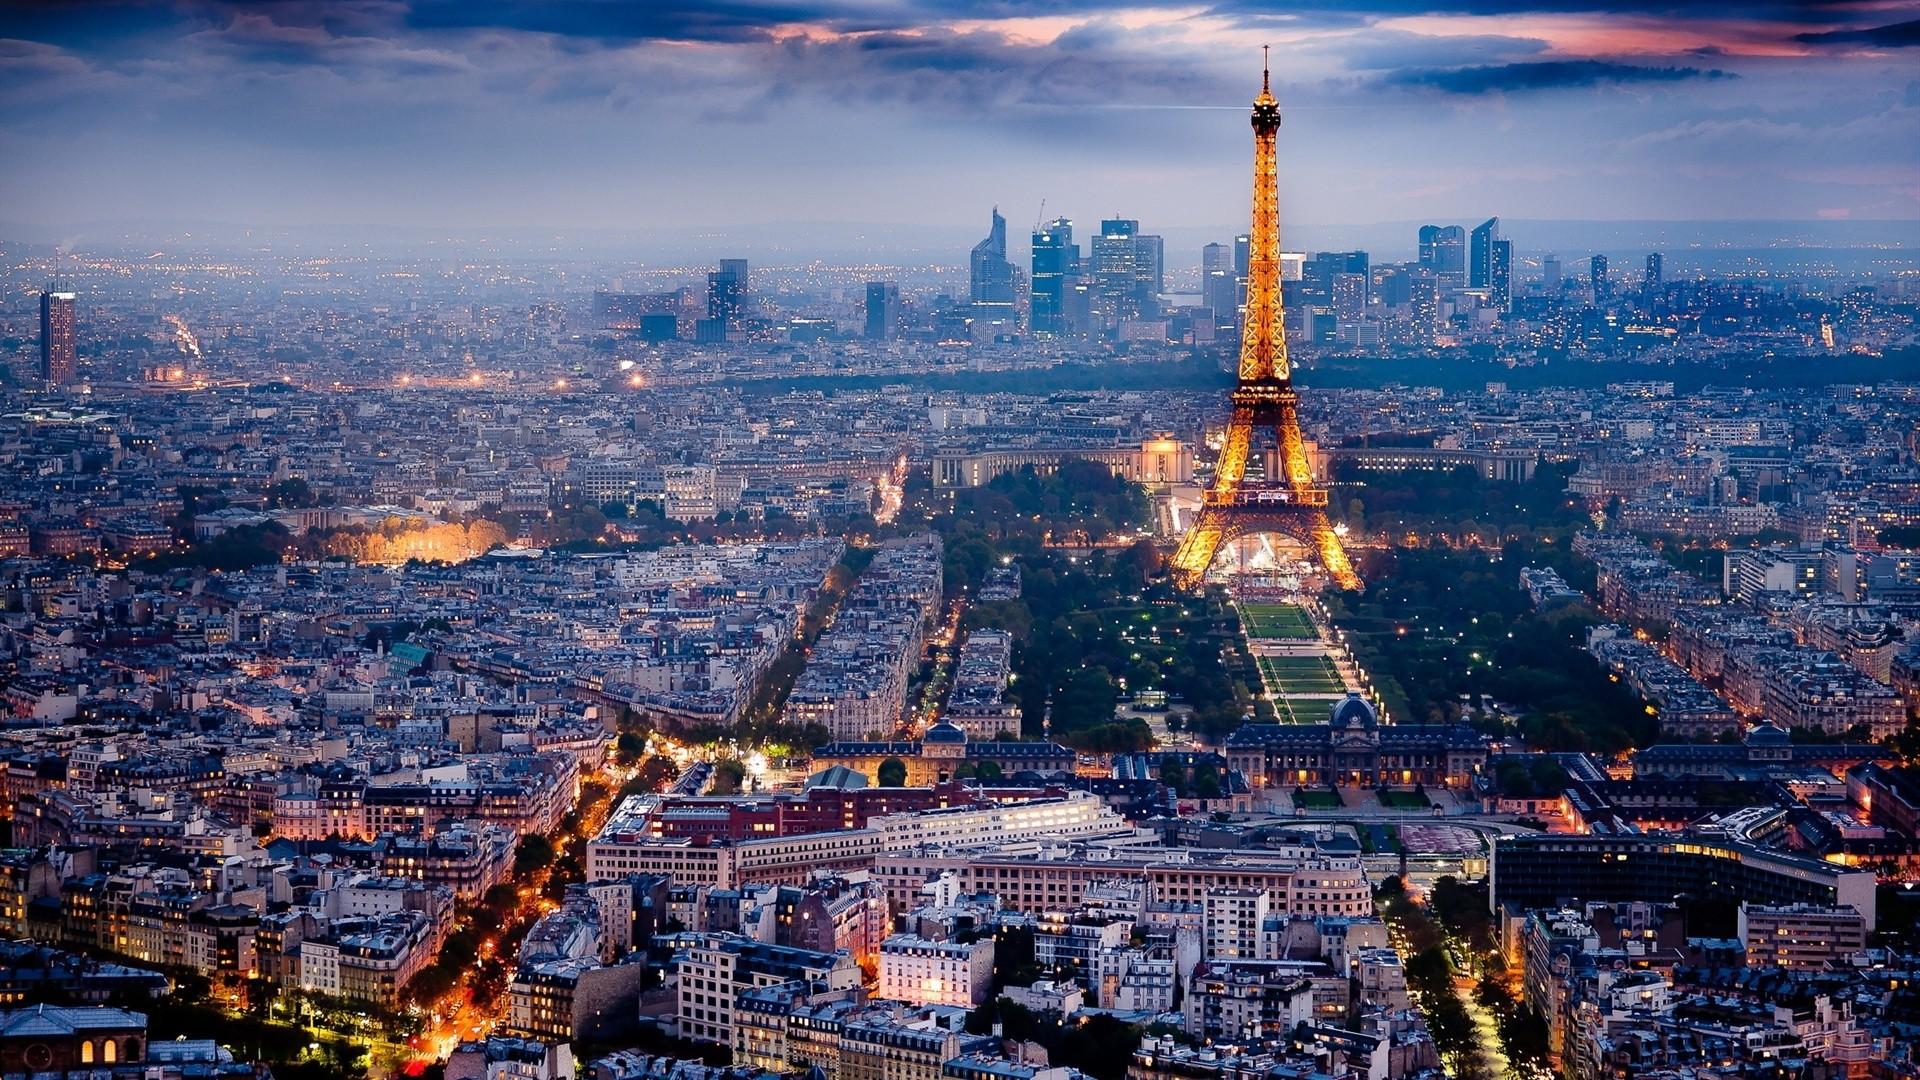 Paris Wallpapers For Desktop Wallpapers) – Adorable Wallpapers